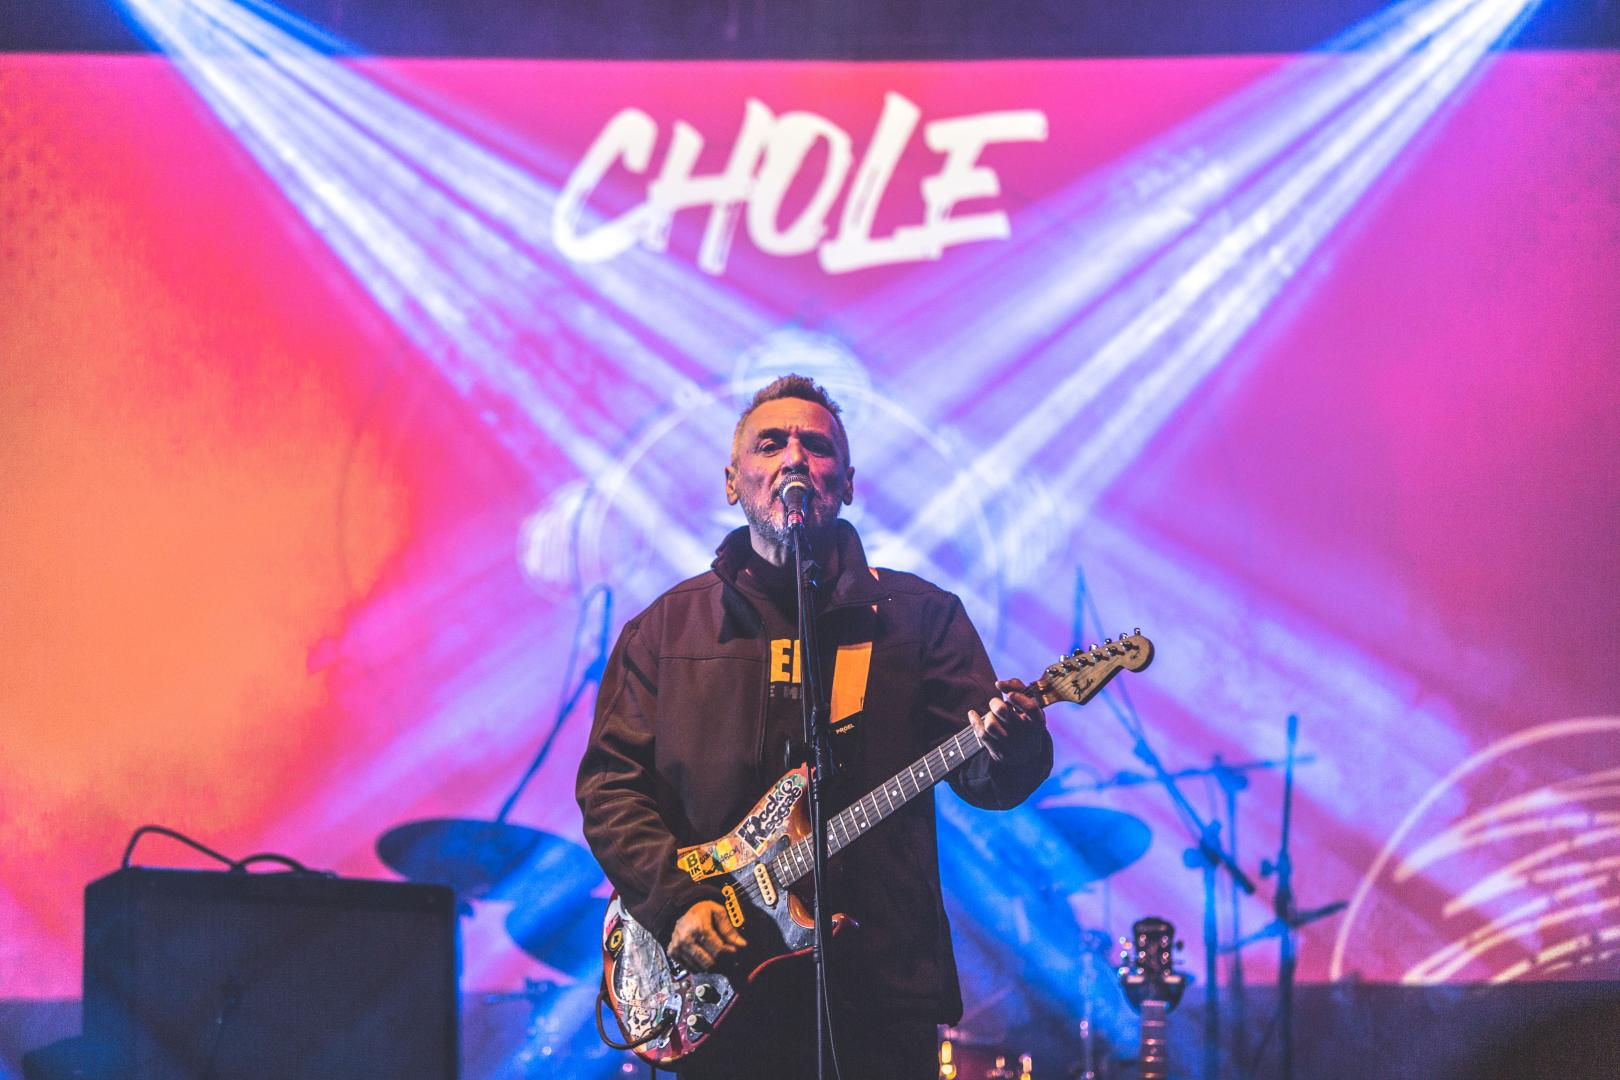 Chole